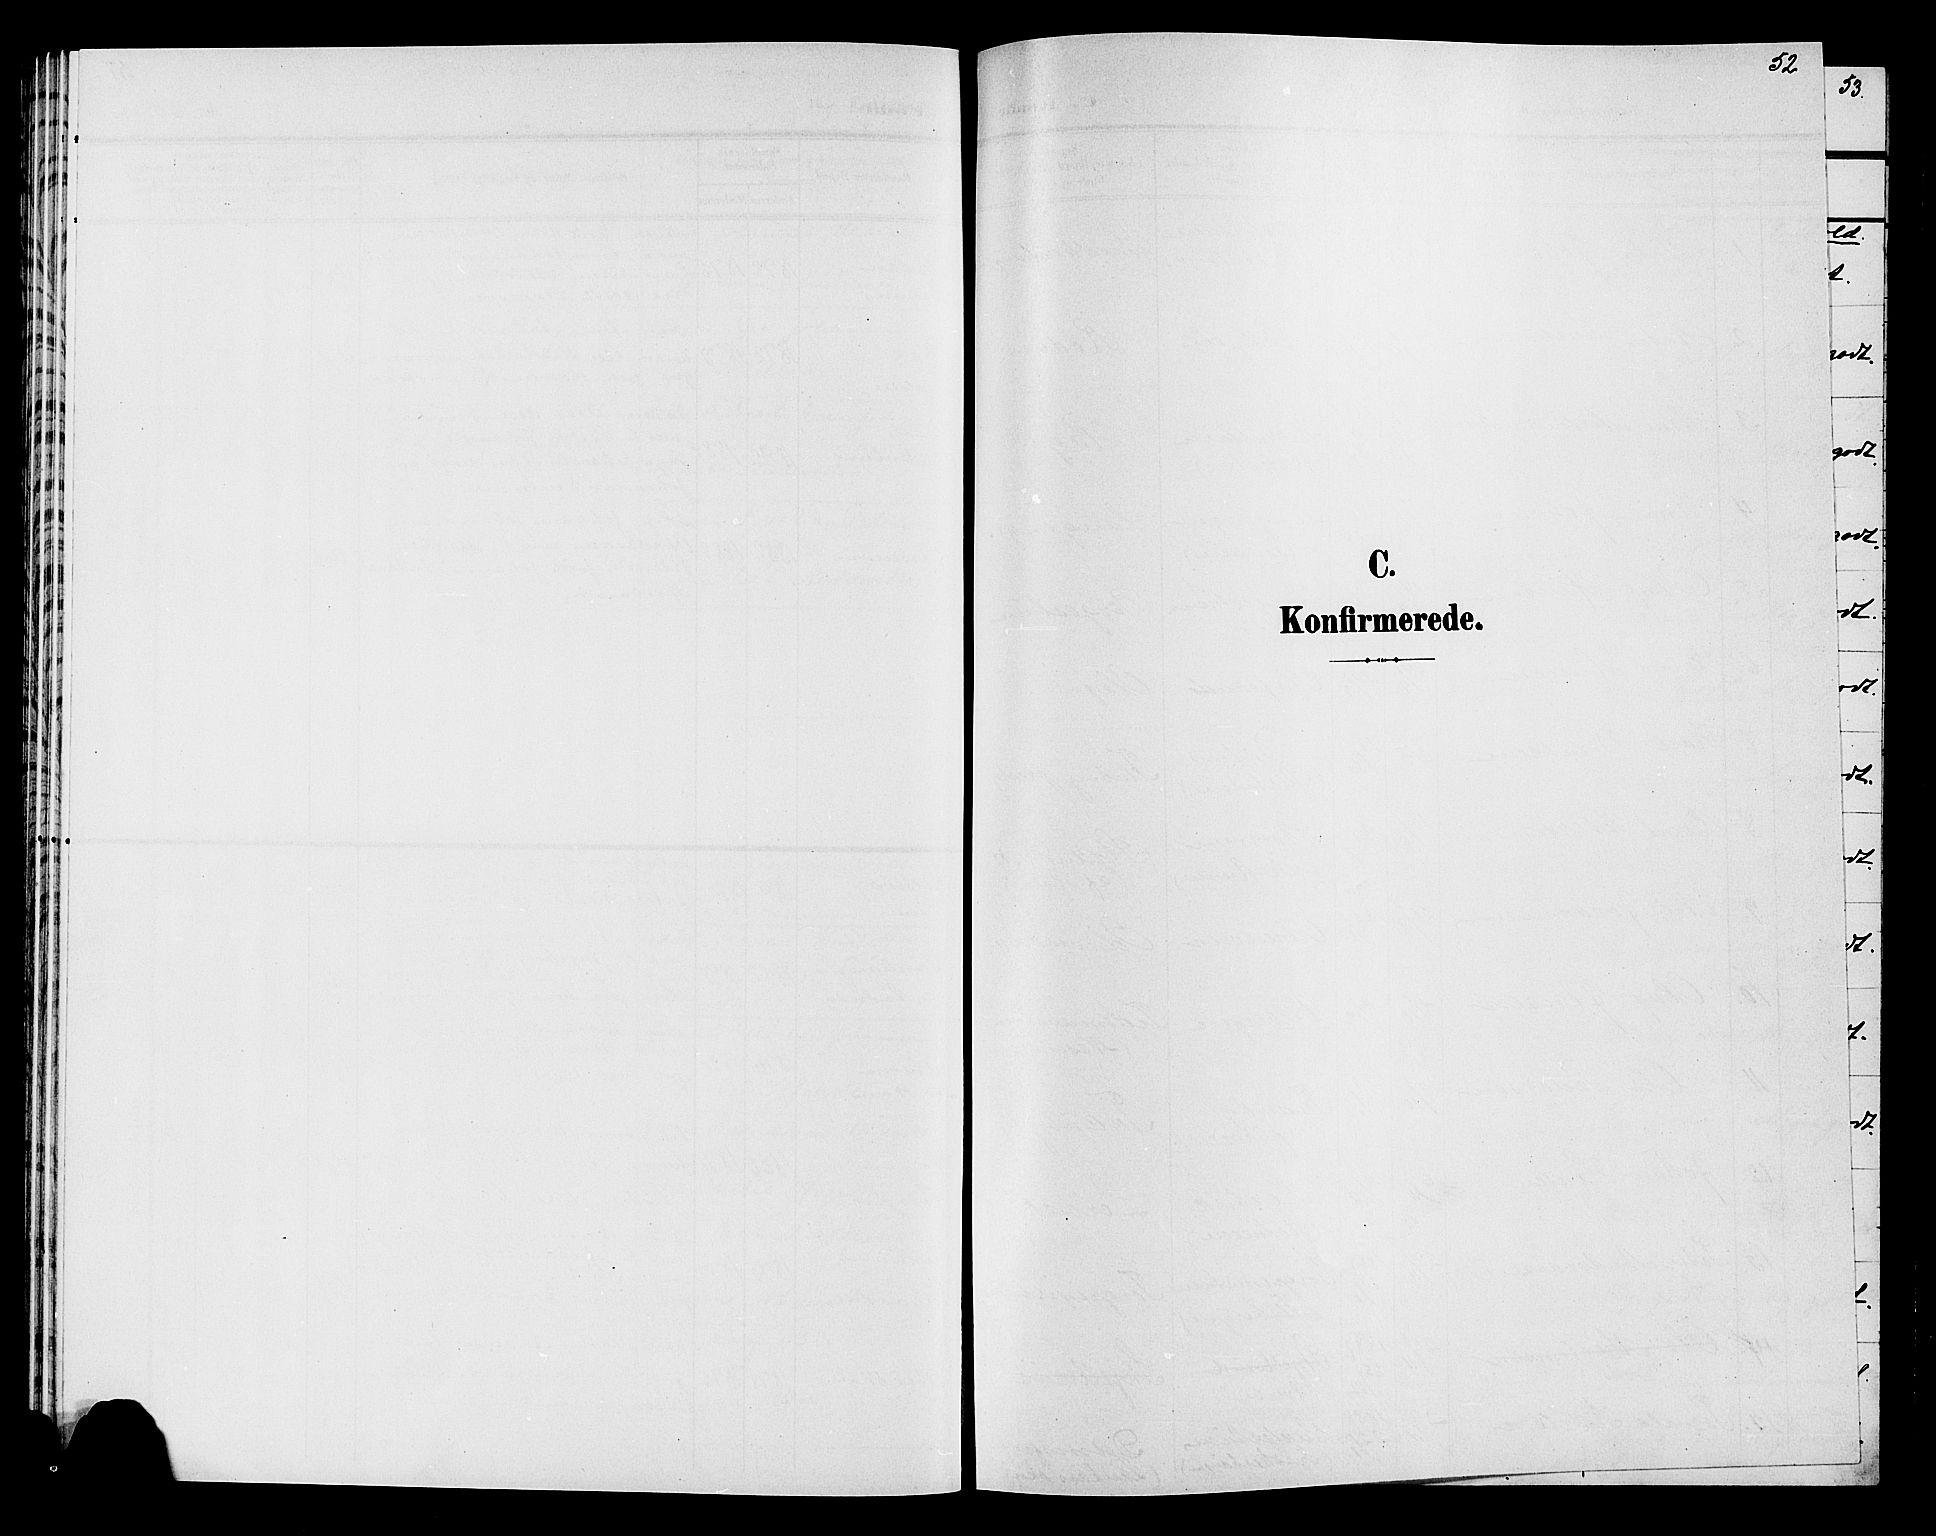 SAH, Søndre Land prestekontor, L/L0005: Klokkerbok nr. 5, 1902-1911, s. 52